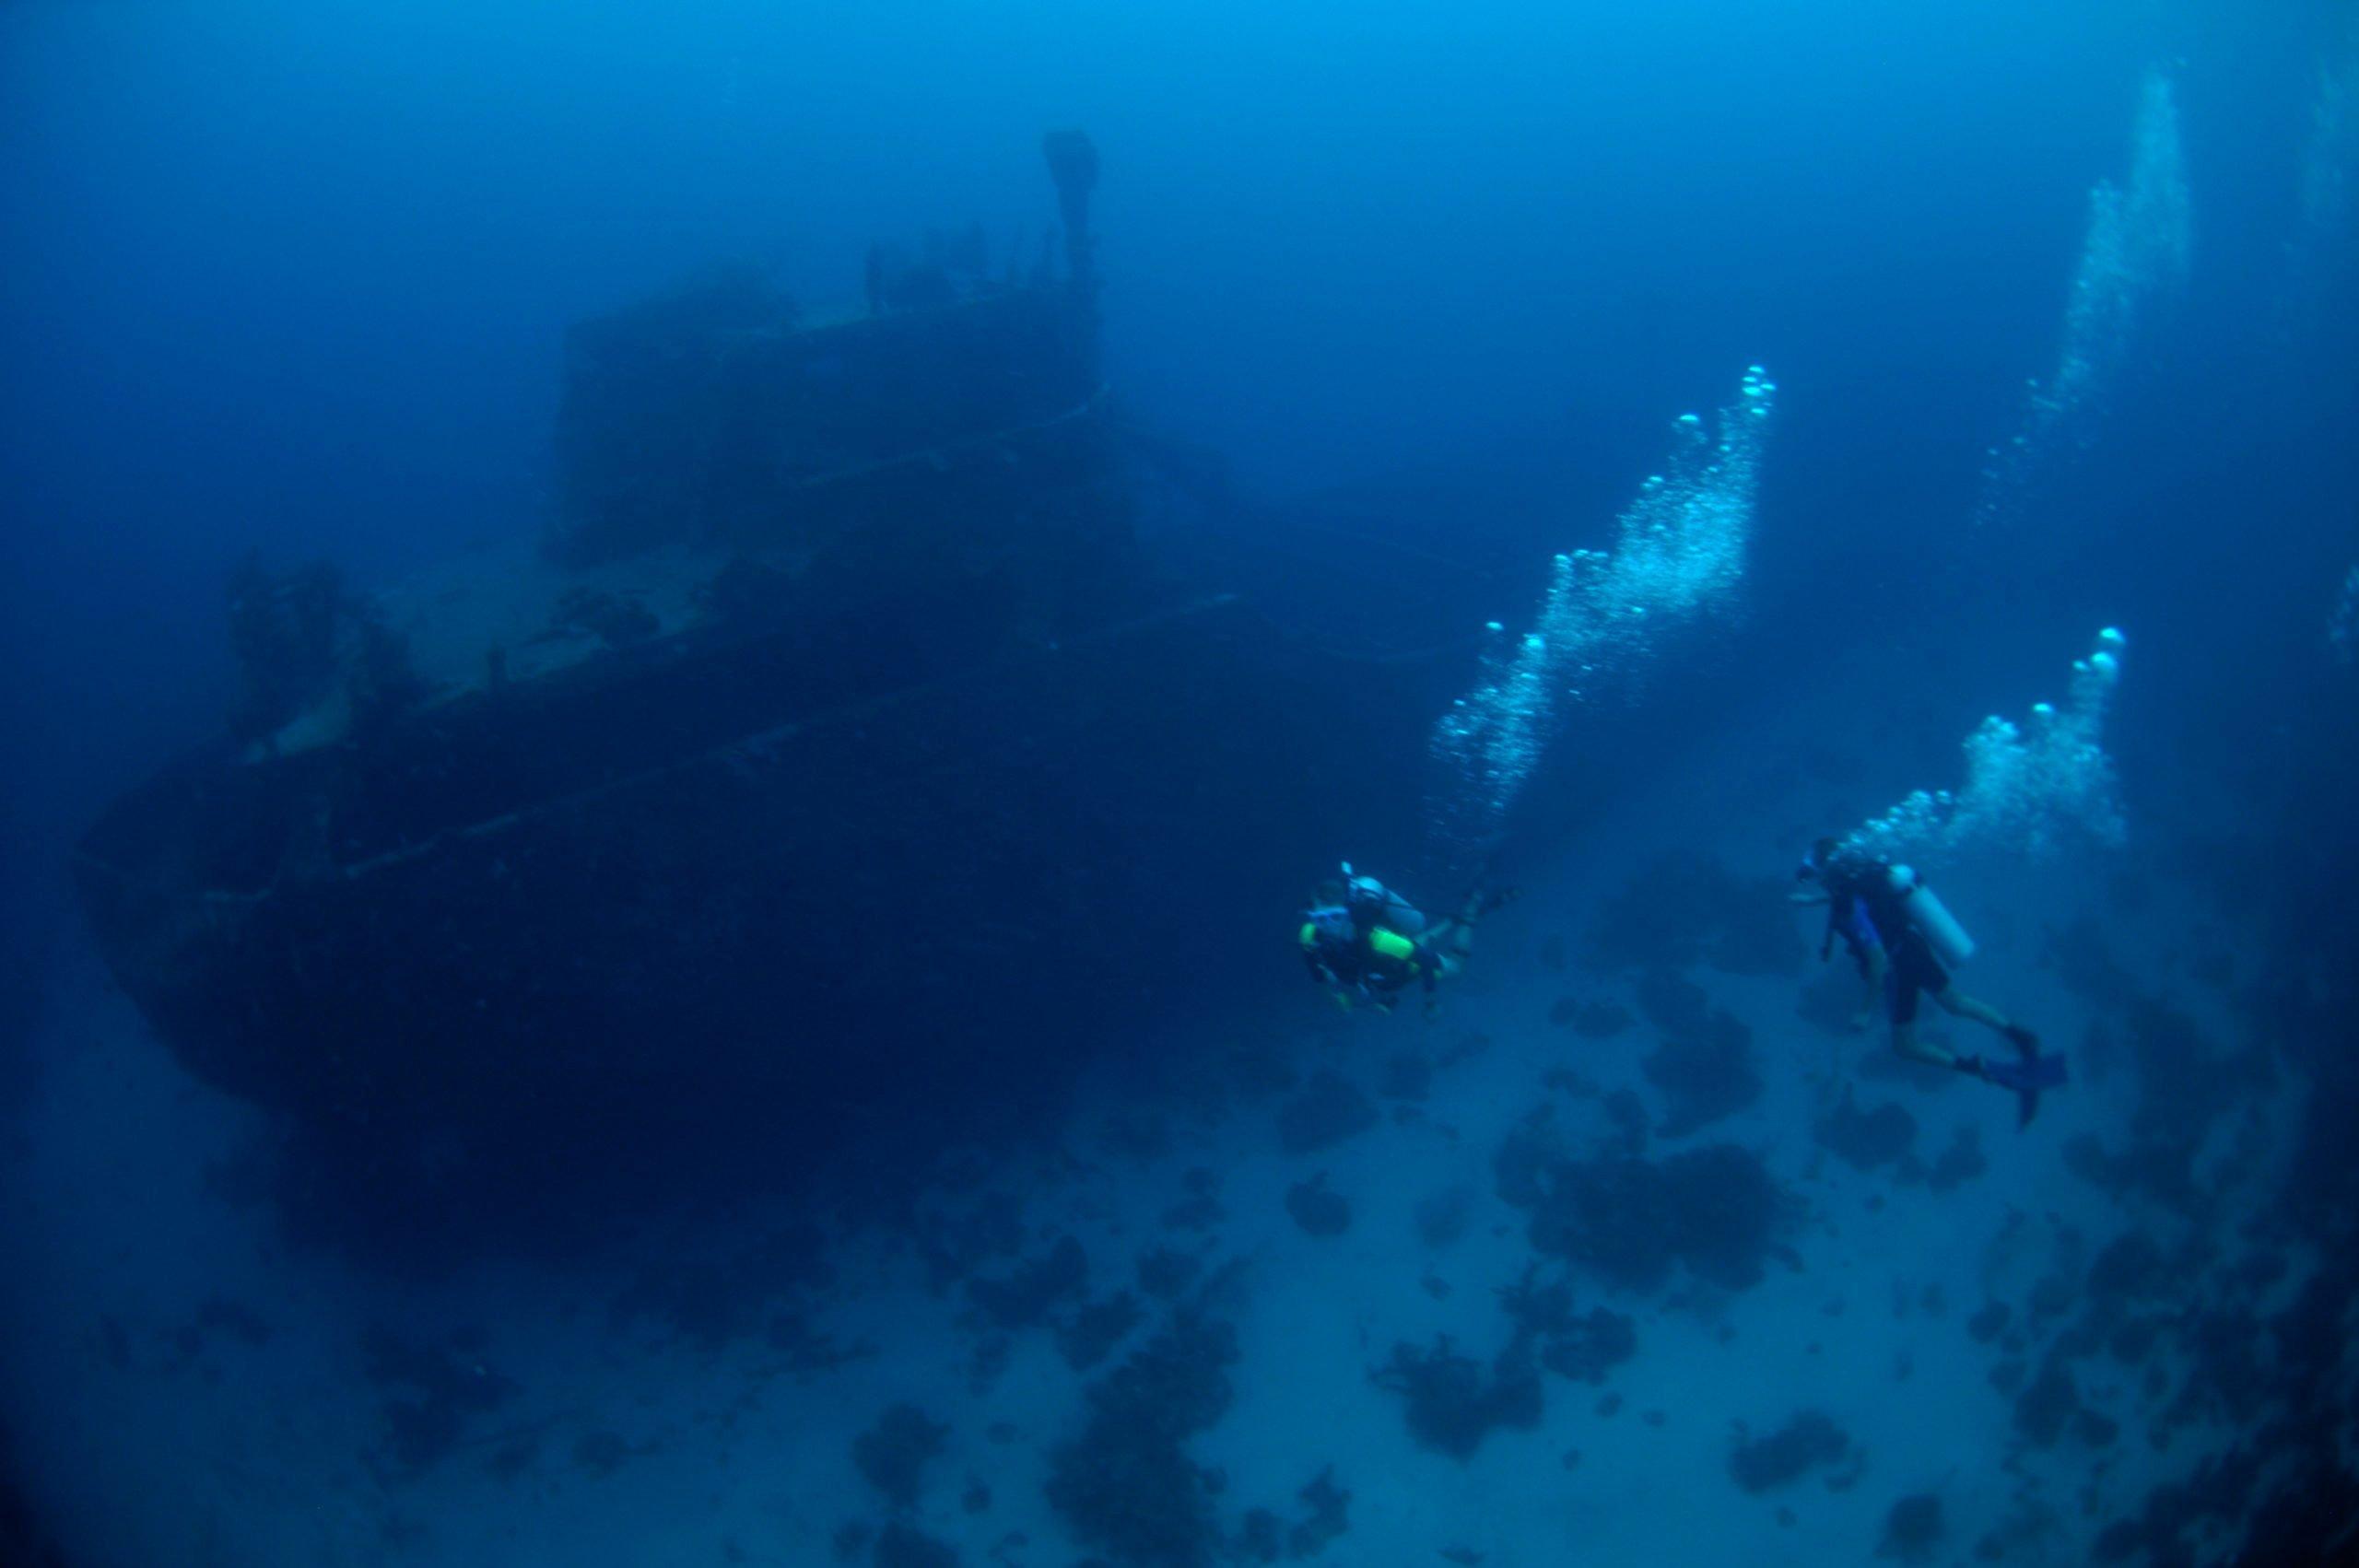 Superior Producer wreck dive Ship lies at 85-100 feet on sand flat Curacao, Netherlands Antilles Digital Photo (horizontal)